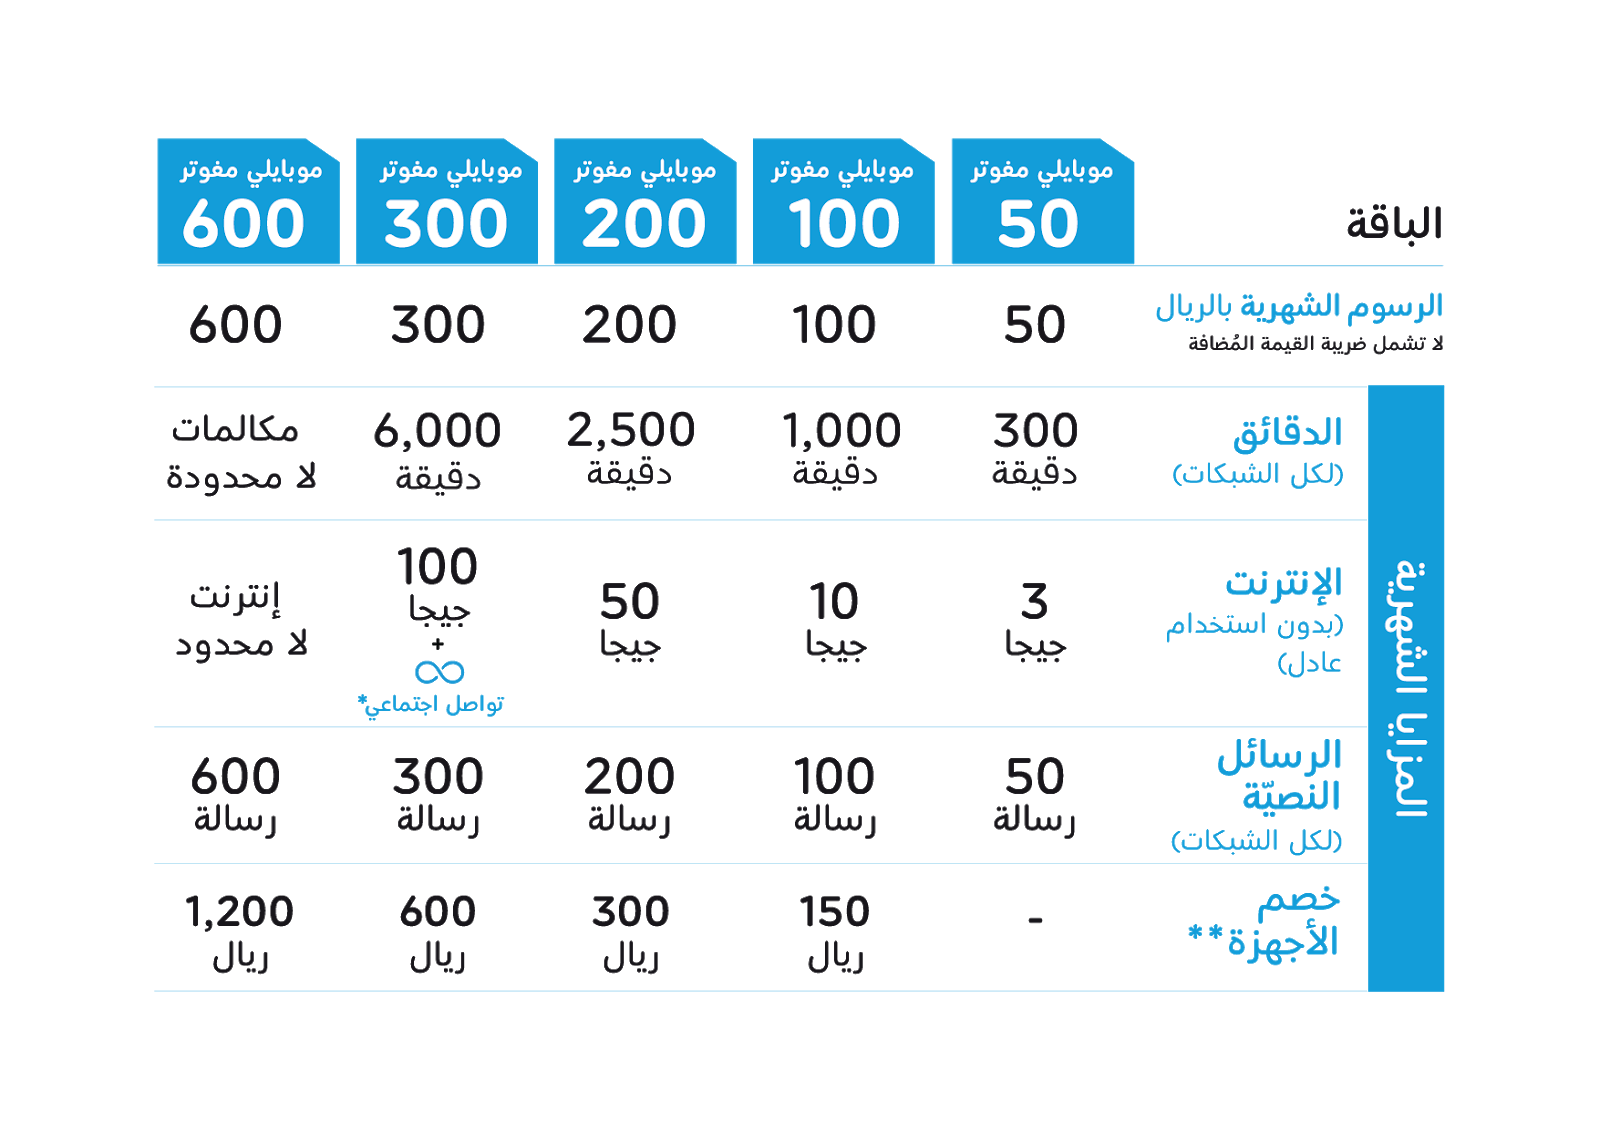 تفاصيل عن باقات موبايلي مفوتر 2020